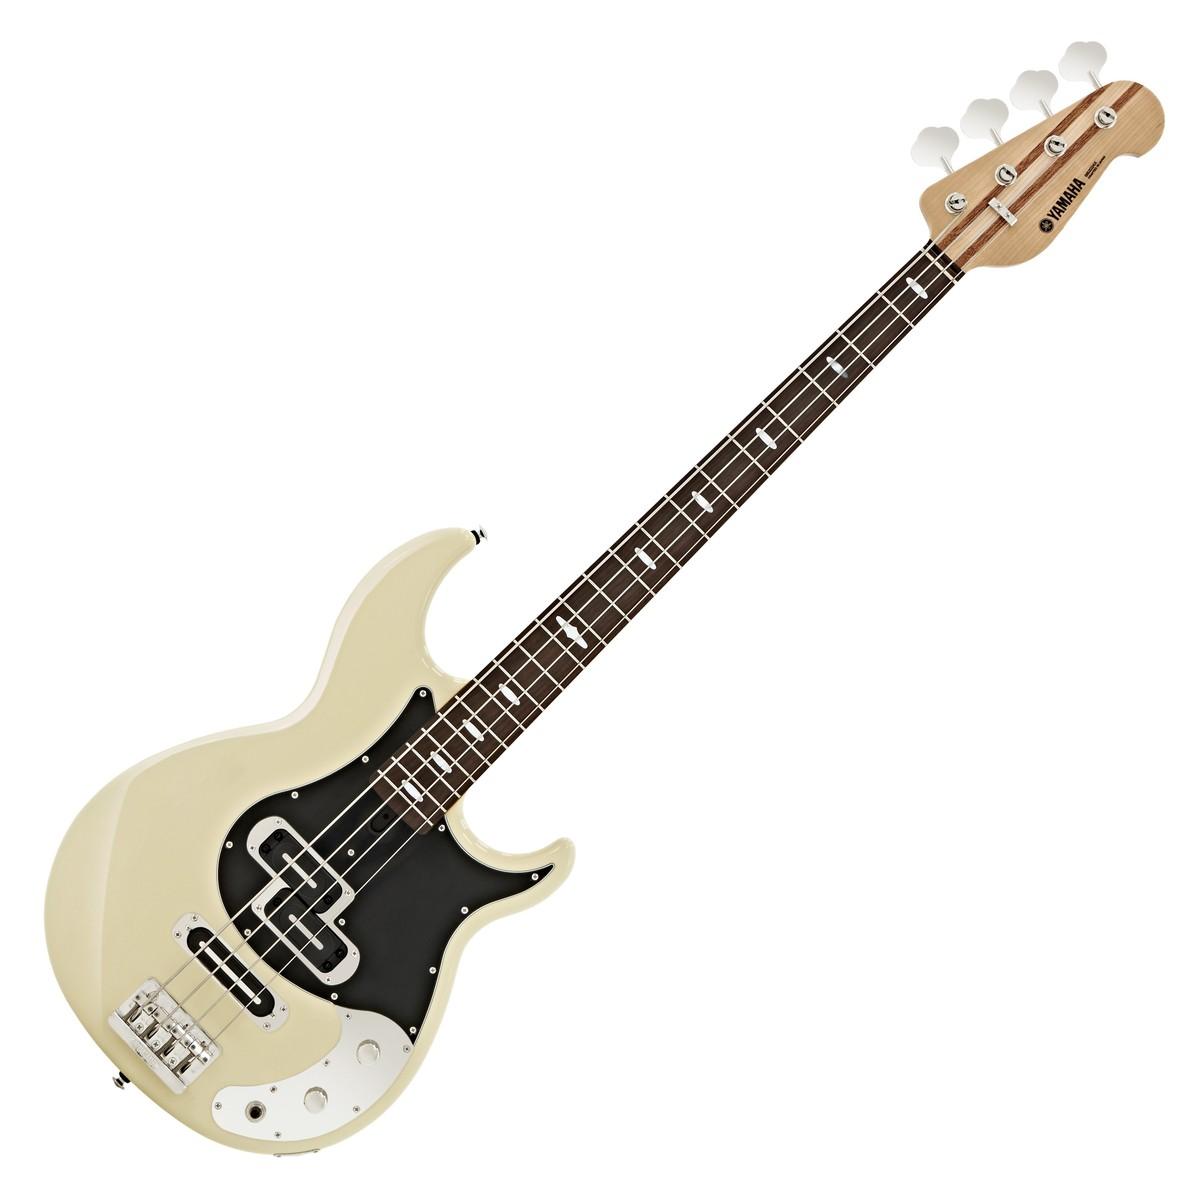 yamaha bb2024x bass guitar vintage white at. Black Bedroom Furniture Sets. Home Design Ideas